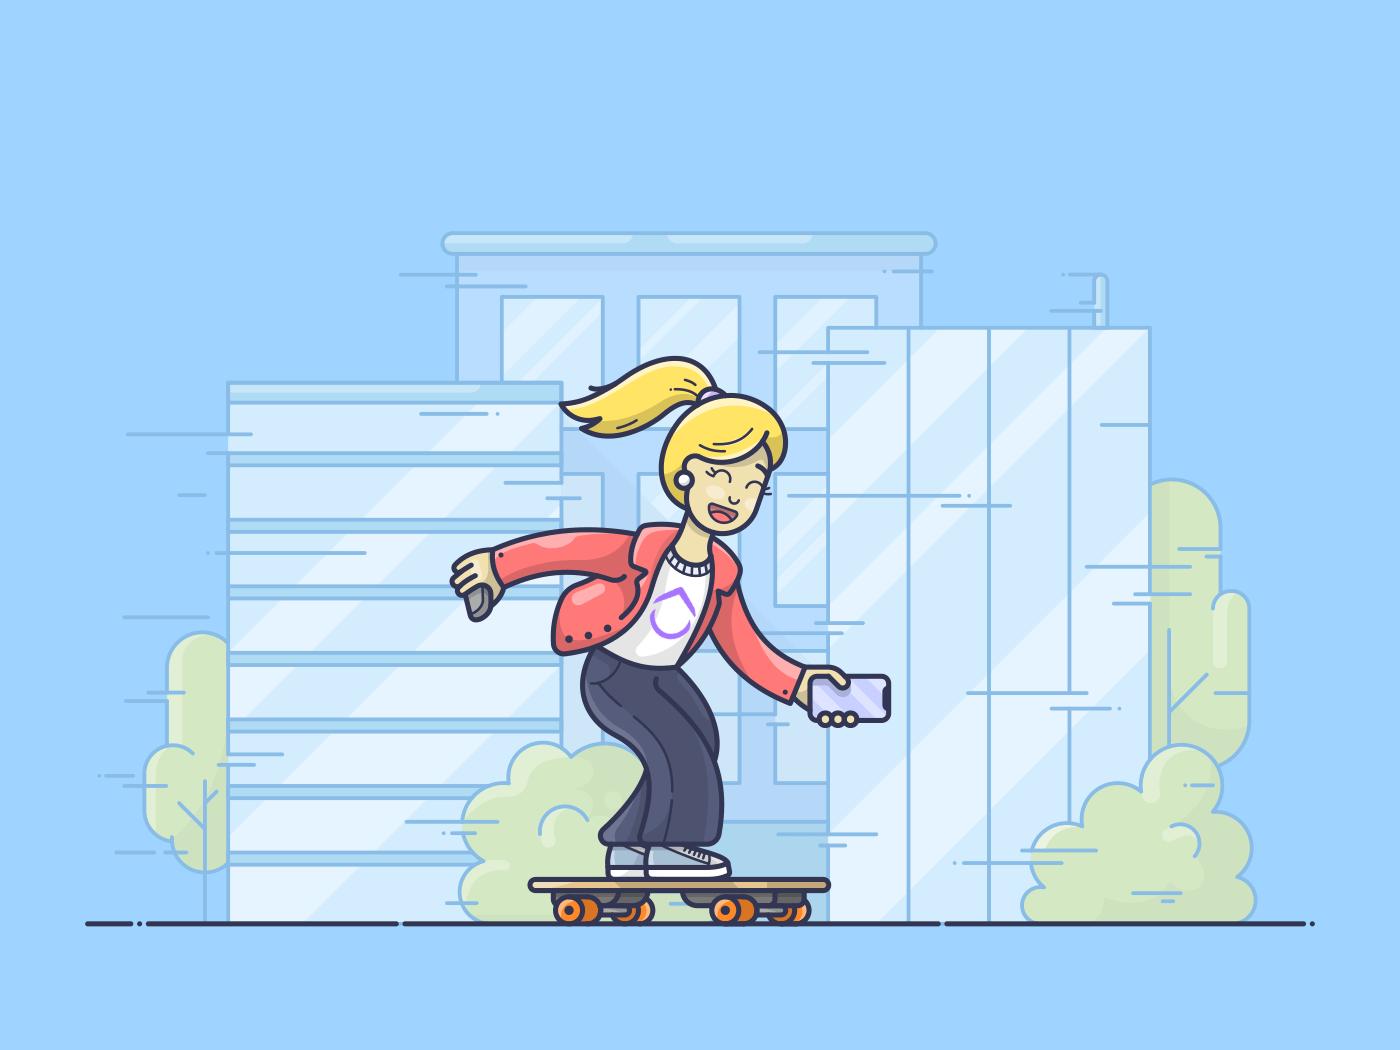 Girl skating by office buildings